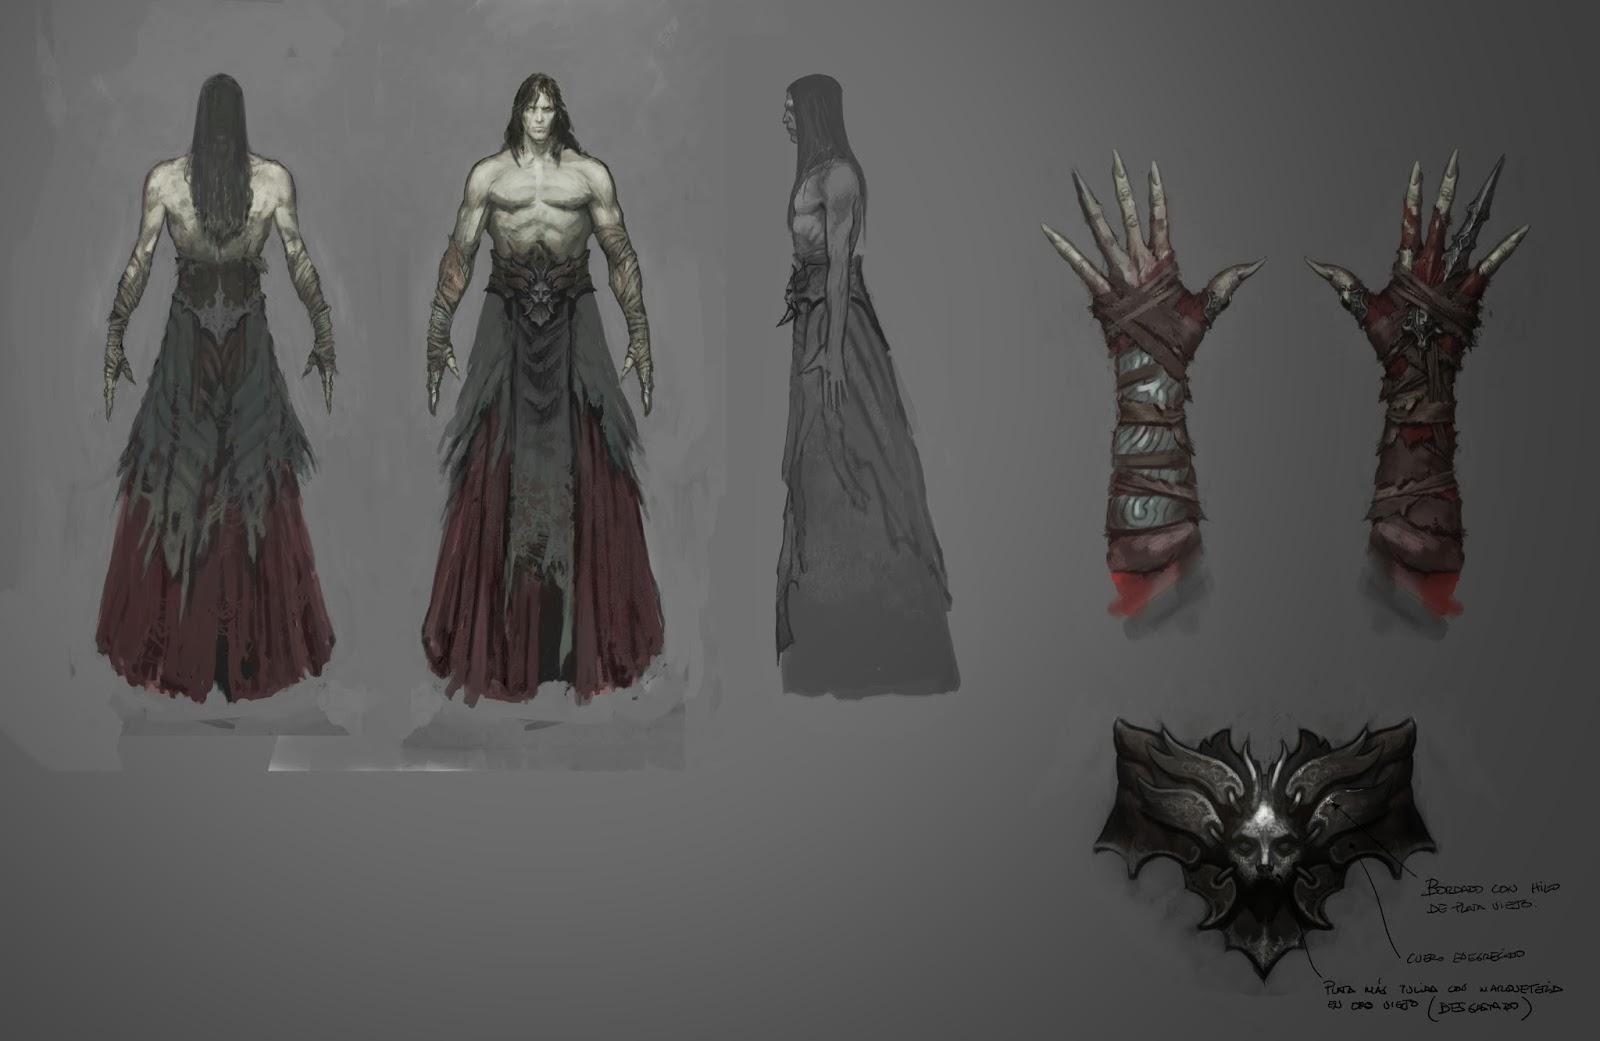 http://game-saga.com/wp-content/uploads/2018/12/castlevania-lords-of-shadow-2-artwork-4.jpg